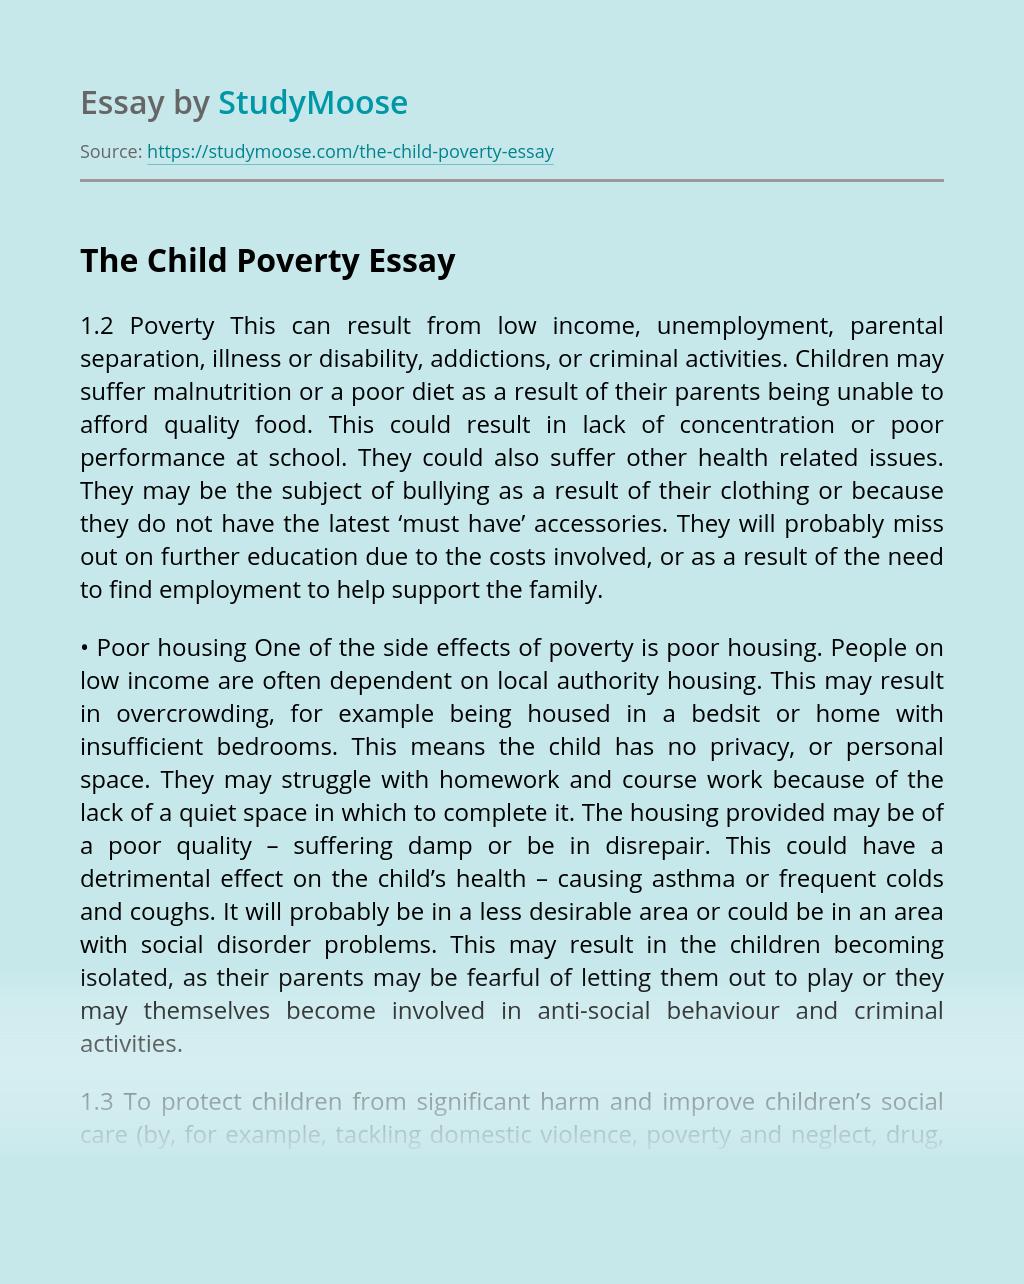 The Child Poverty